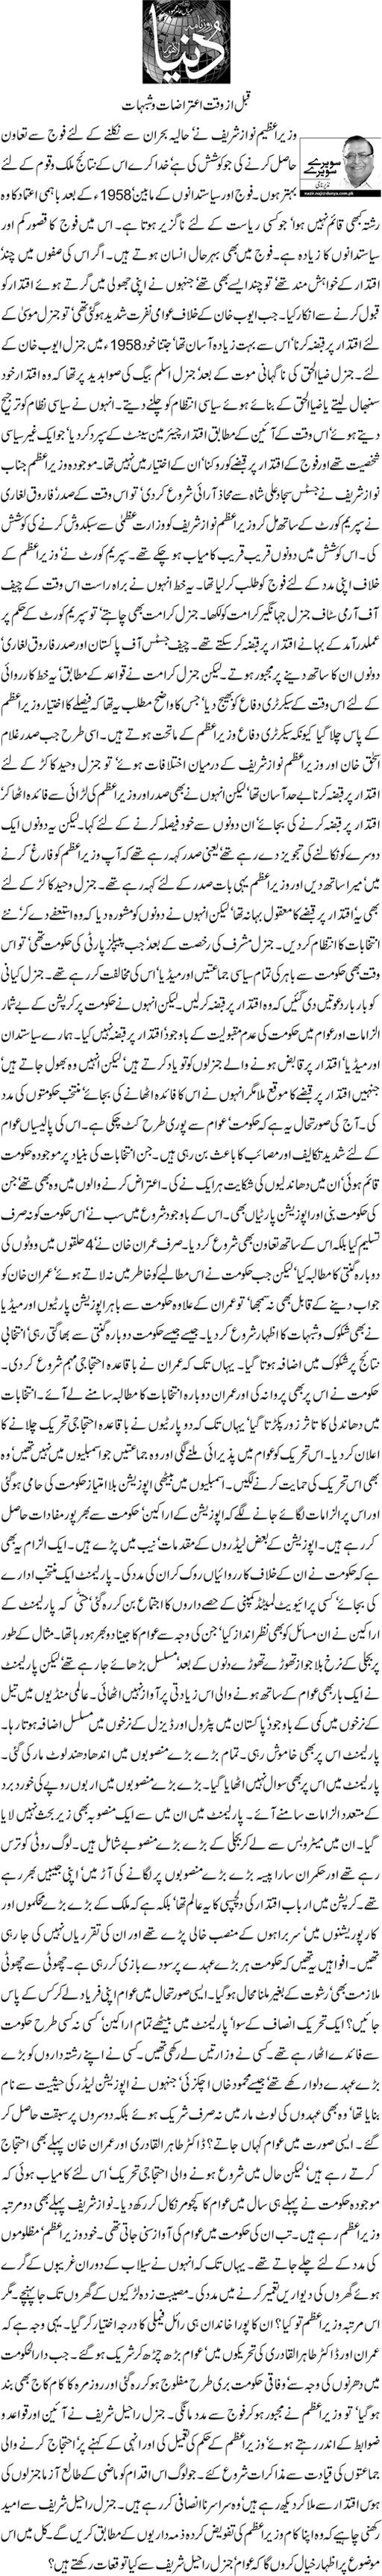 Print Media Coverage Daily Dunya - Nazir Naji